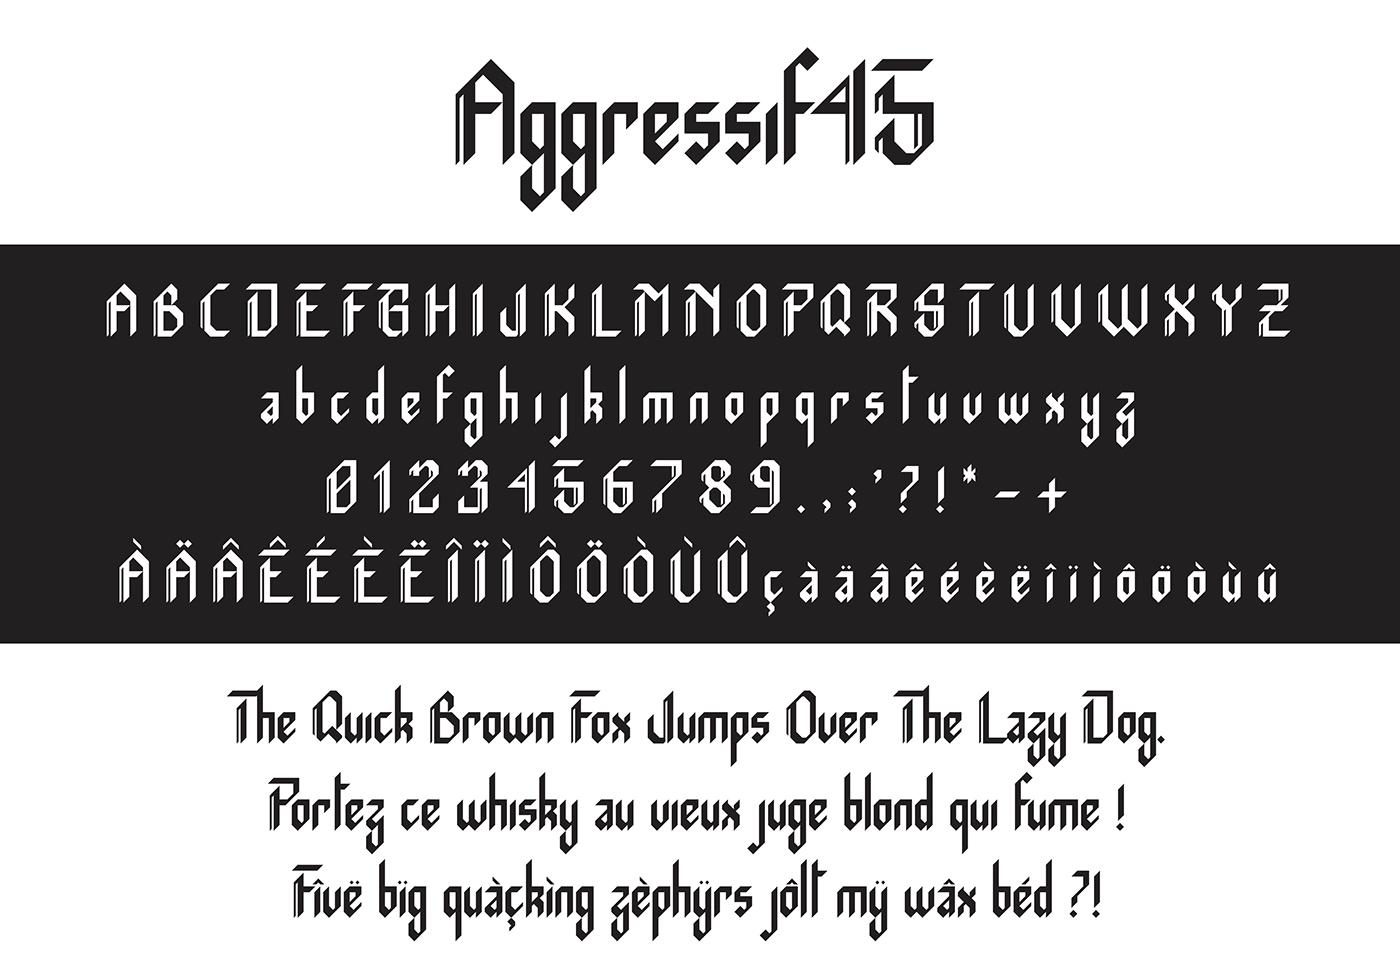 Aggressif 45 Typeface